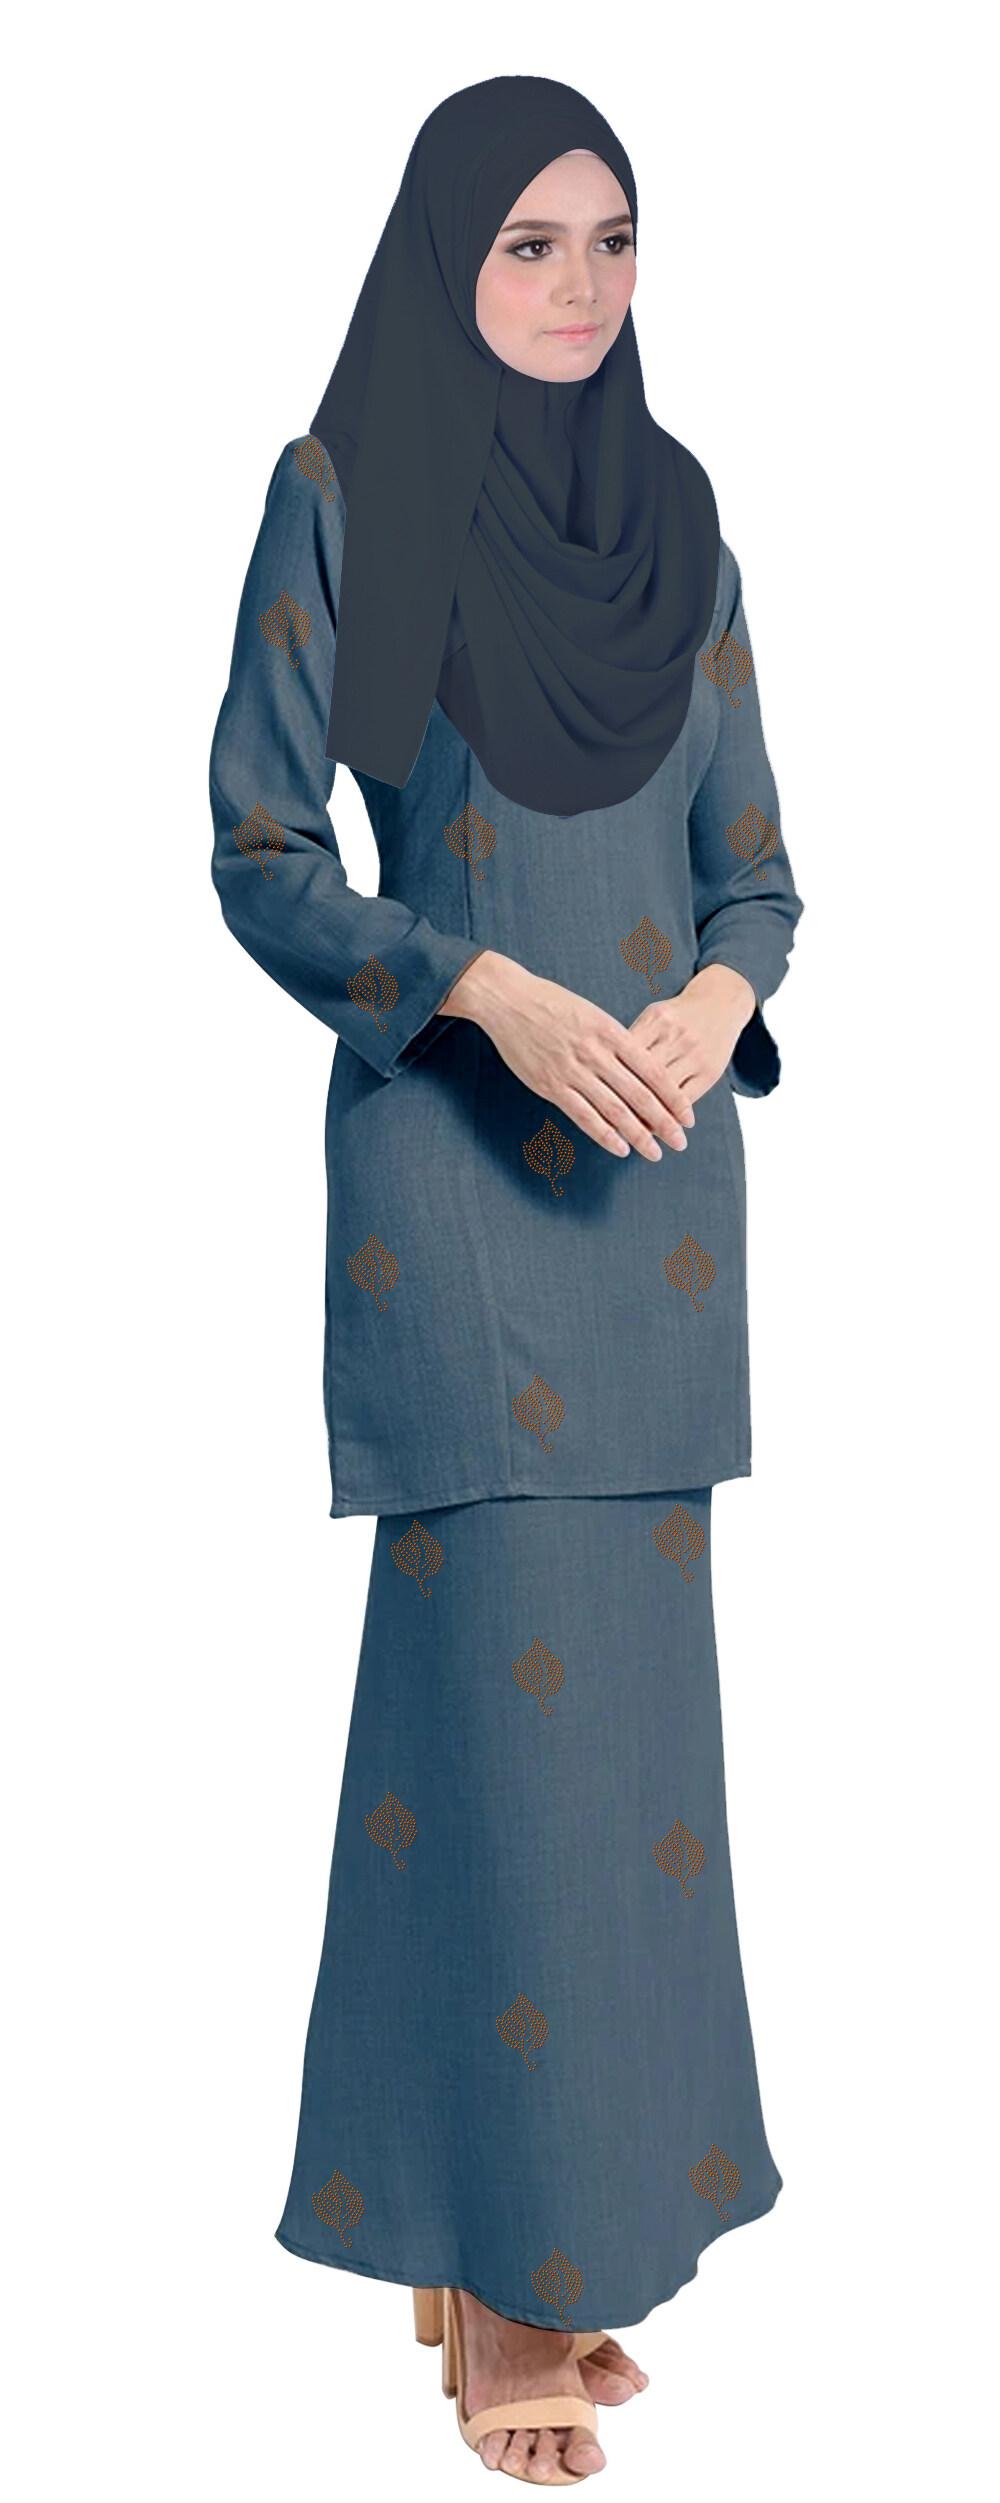 Baju Kurung Tahara For Muslimah Fashoin -Tahara-Grey